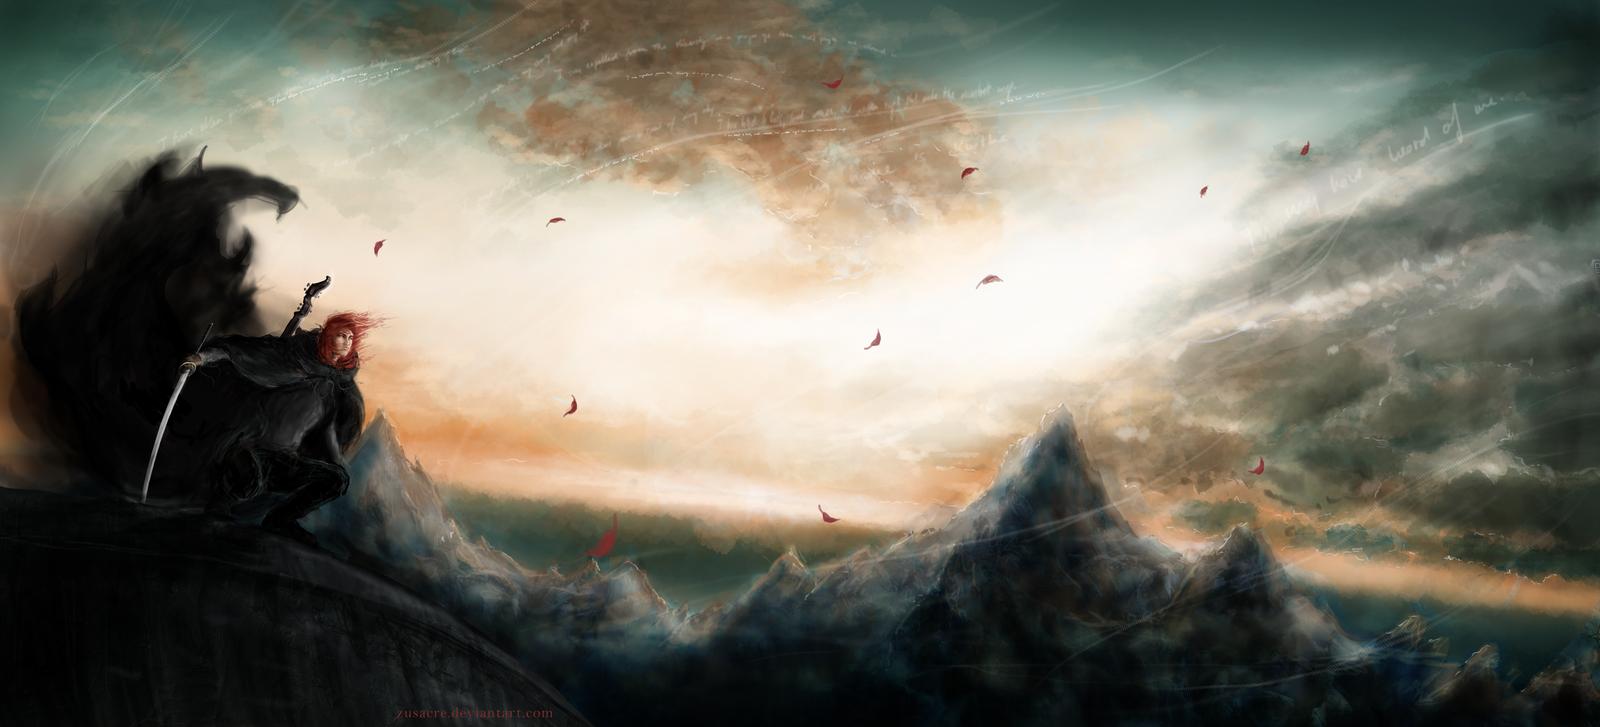 Kvothe by Zusacre